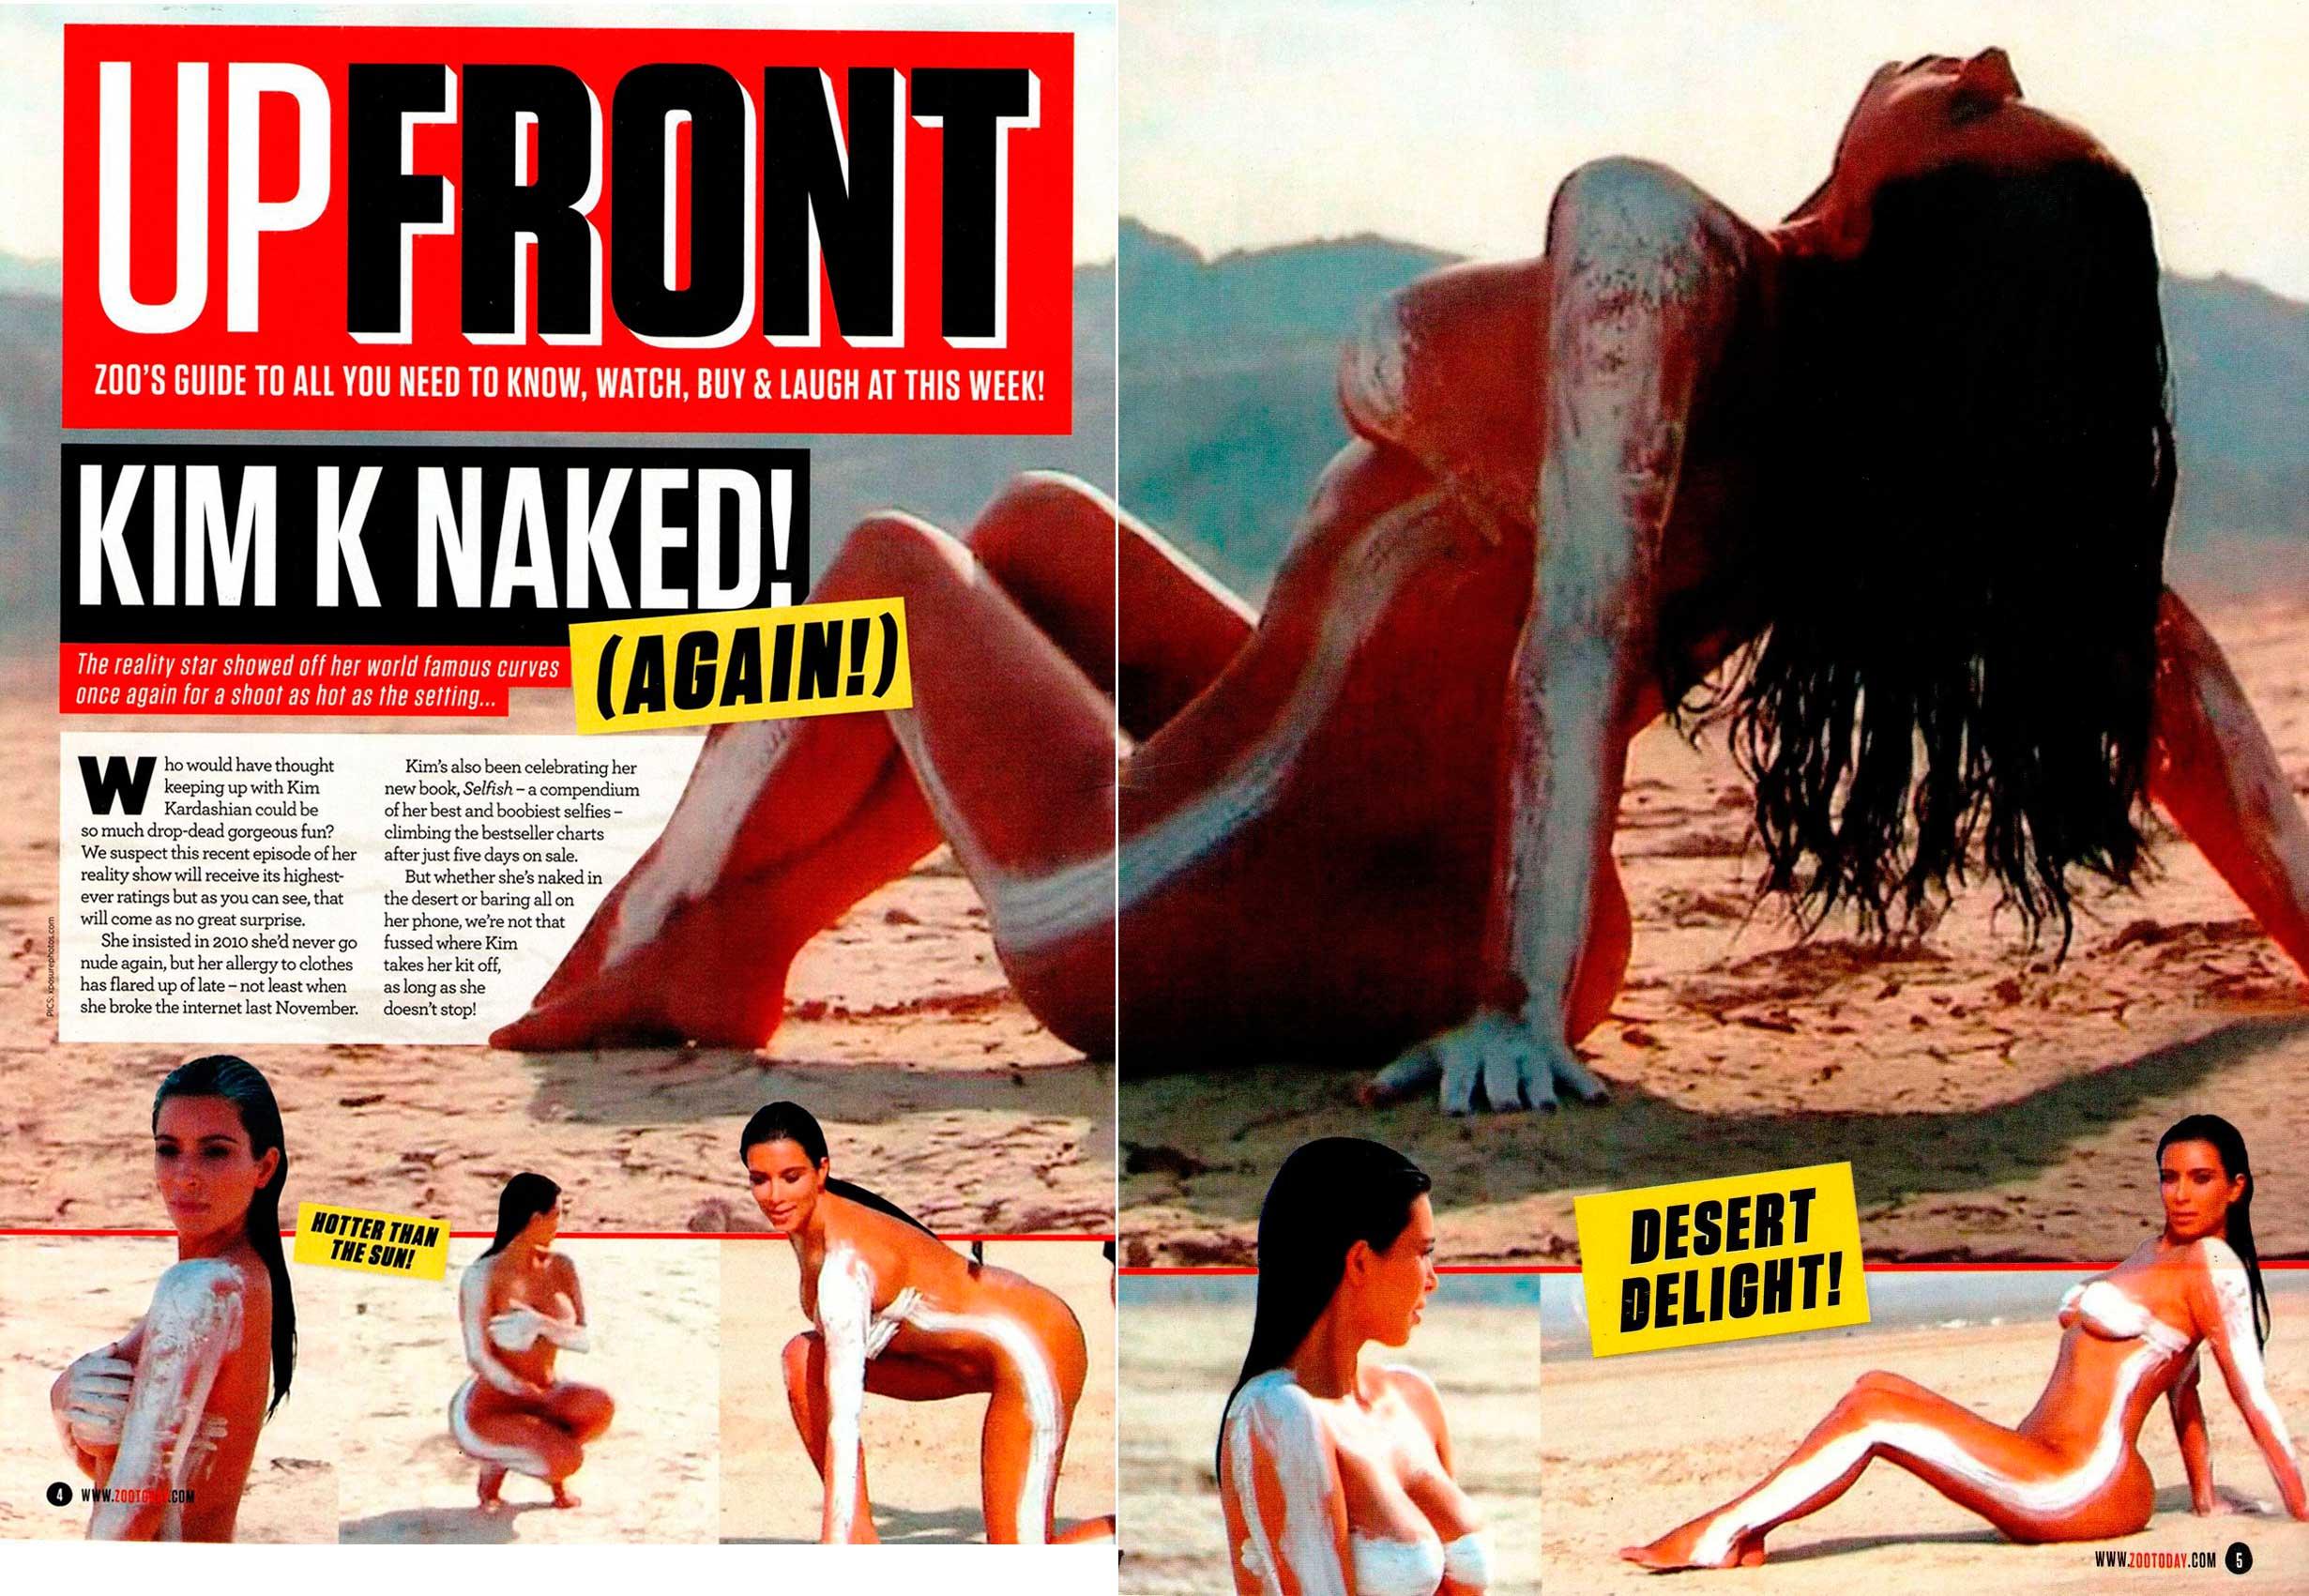 Kim Kardashian Nude Pic